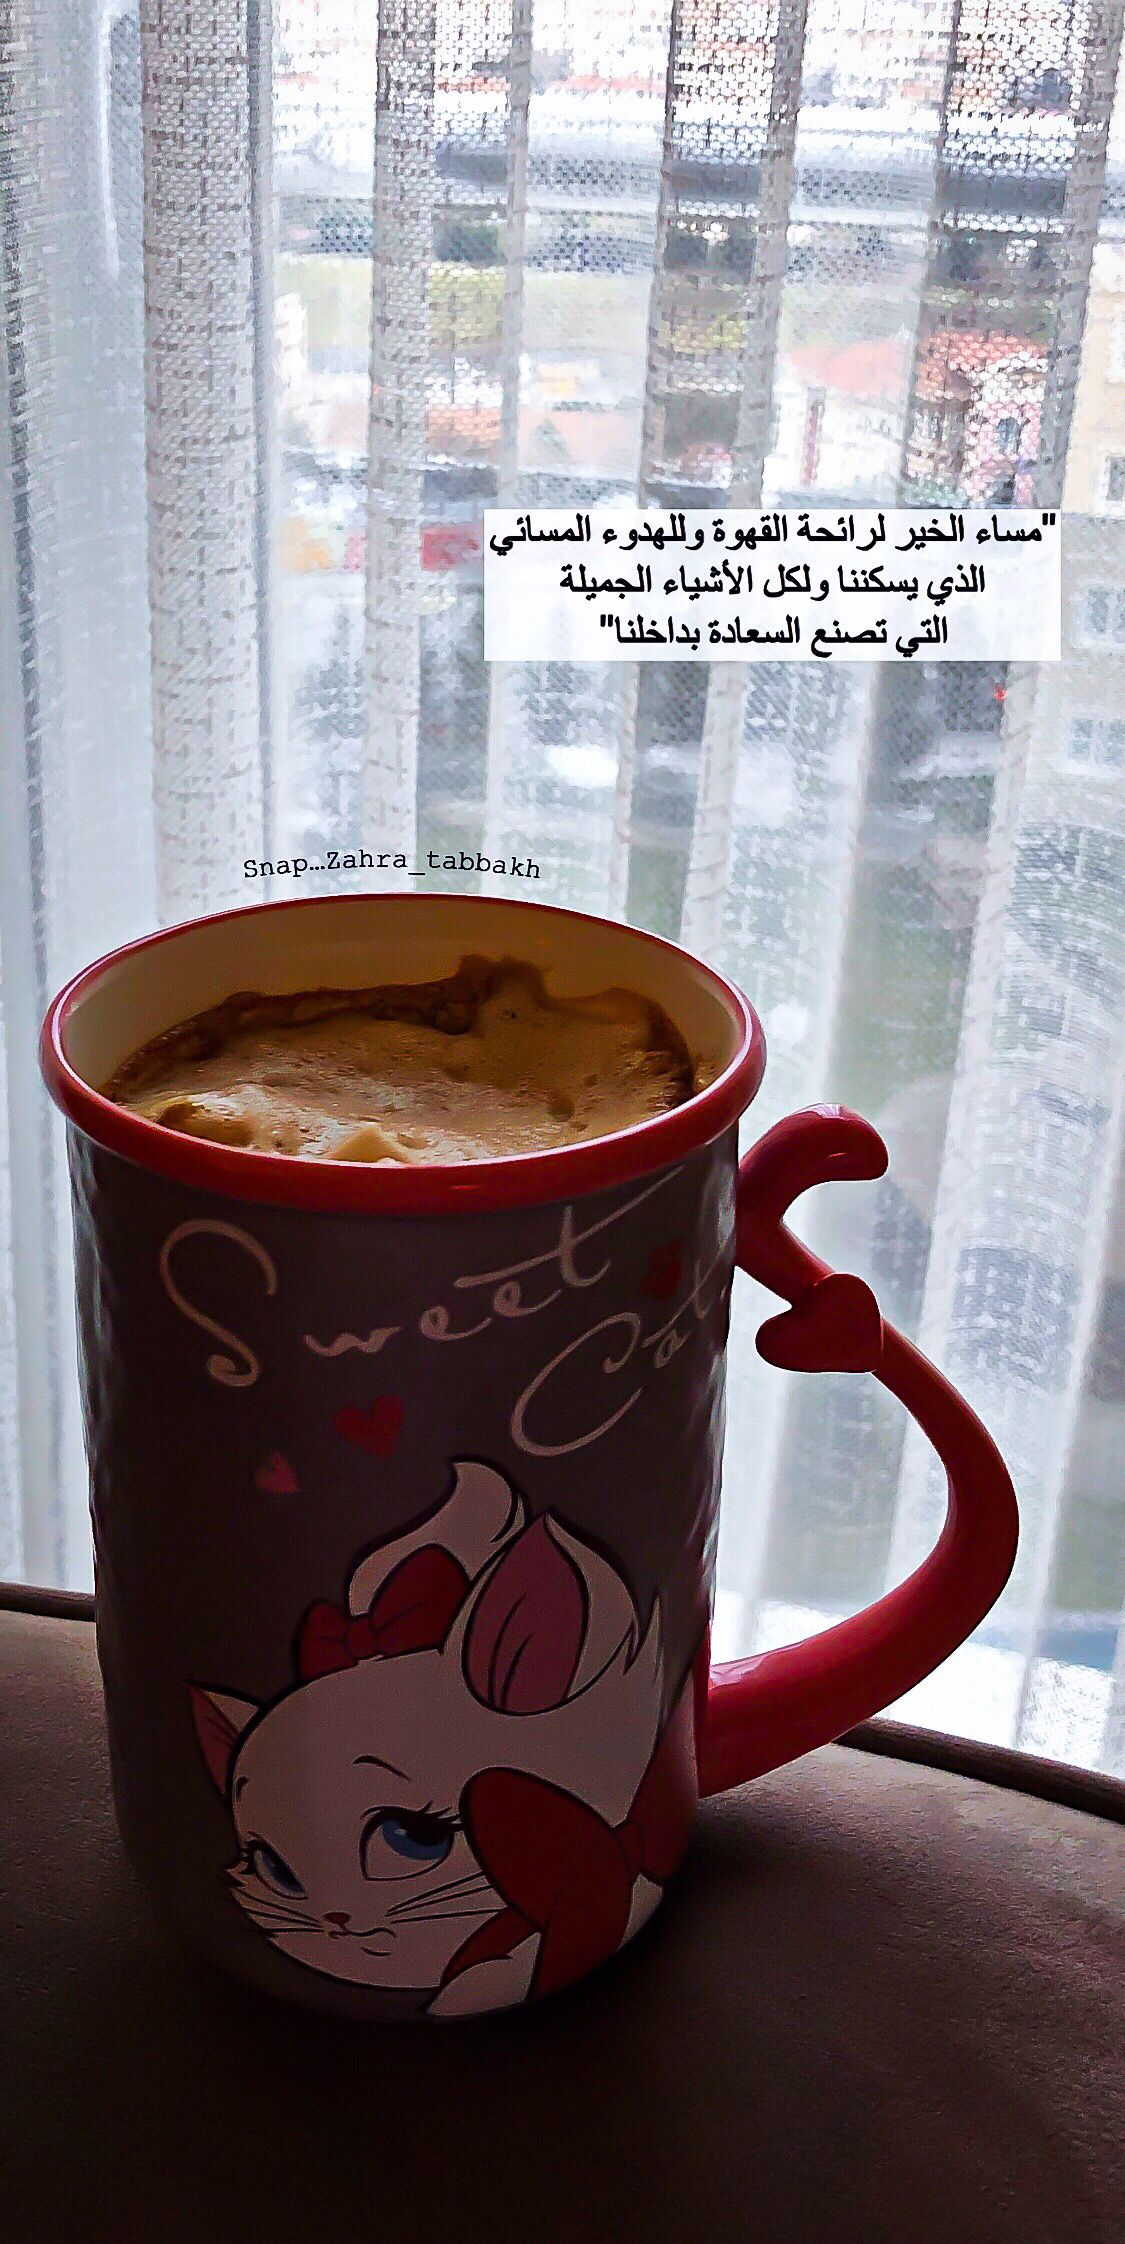 قهوة قهوتي رمزيات بيسيات صباح Cafe Creme Coffee Quotes Iphone Wallpaper Quotes Love